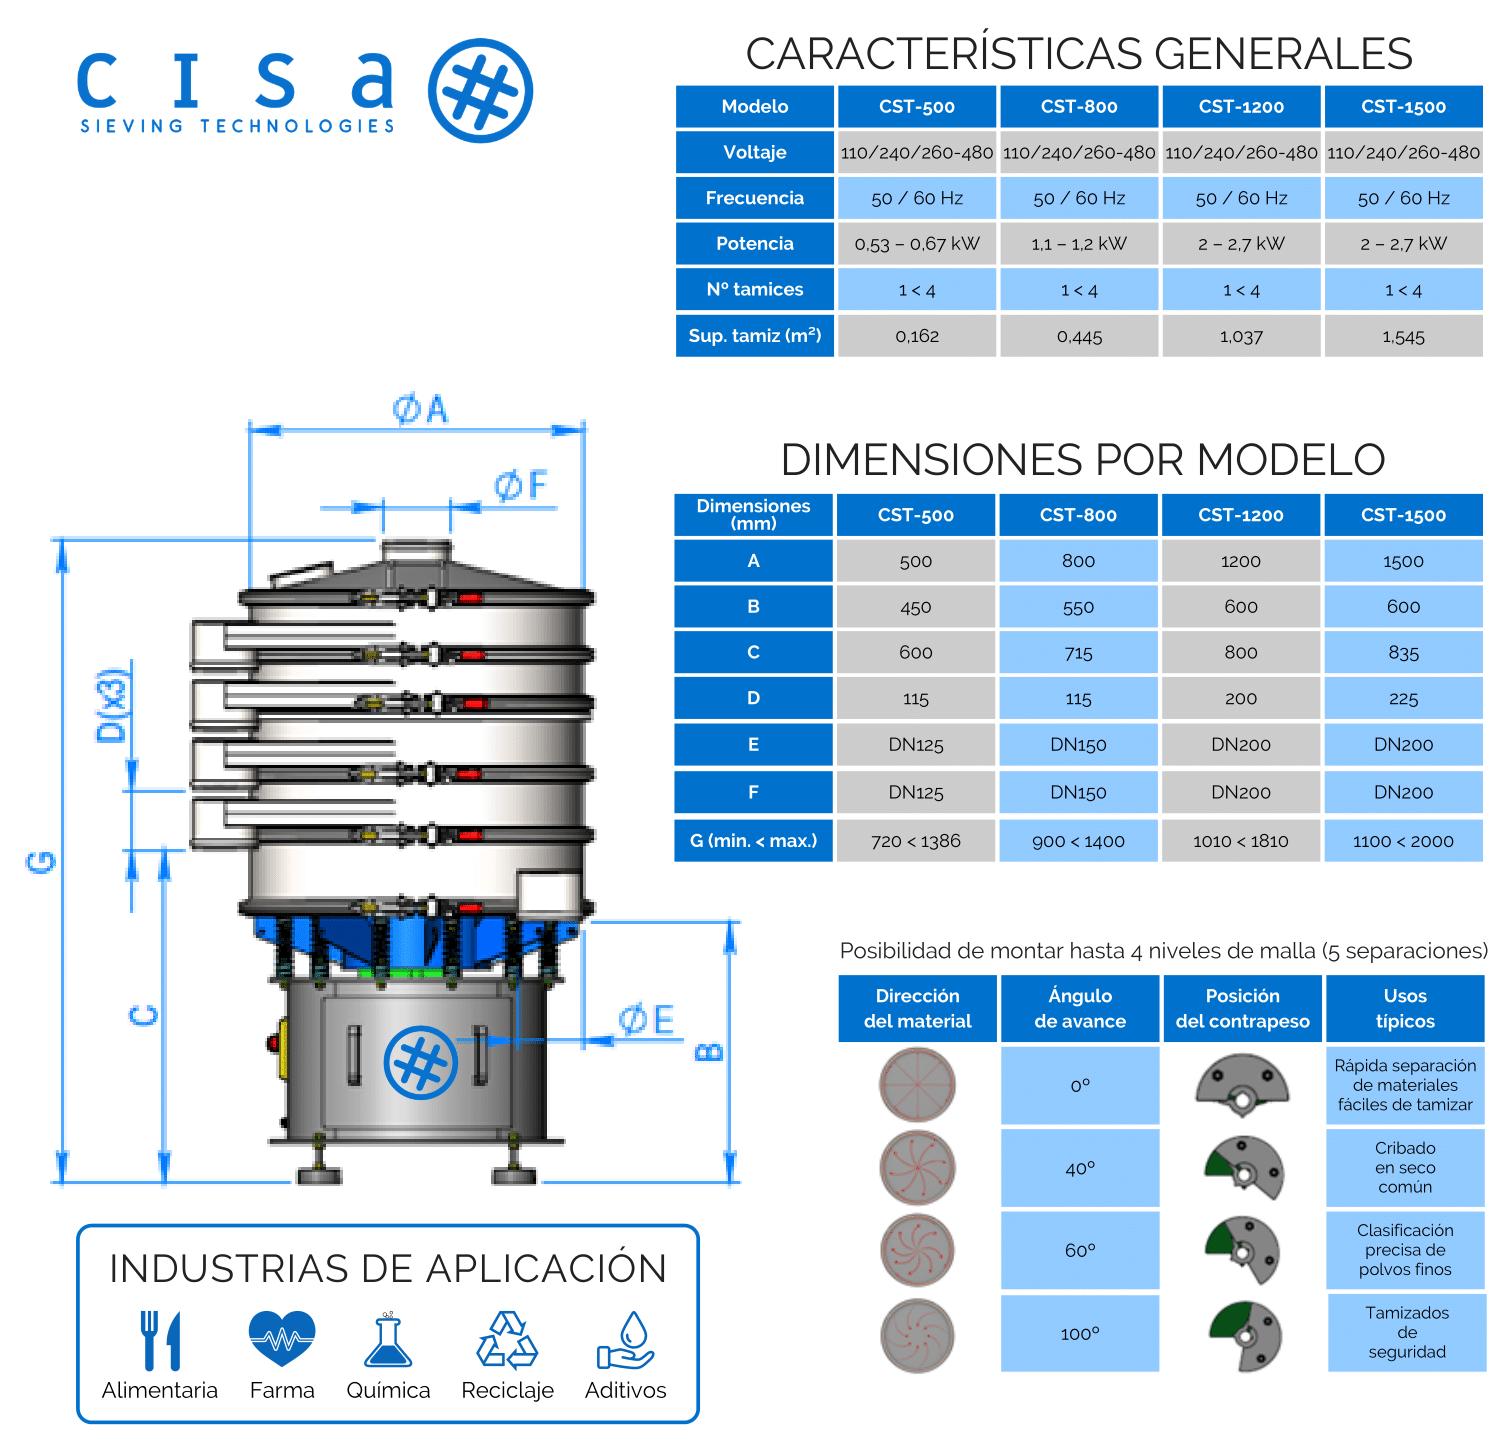 Características generales MULTIDESK series CST